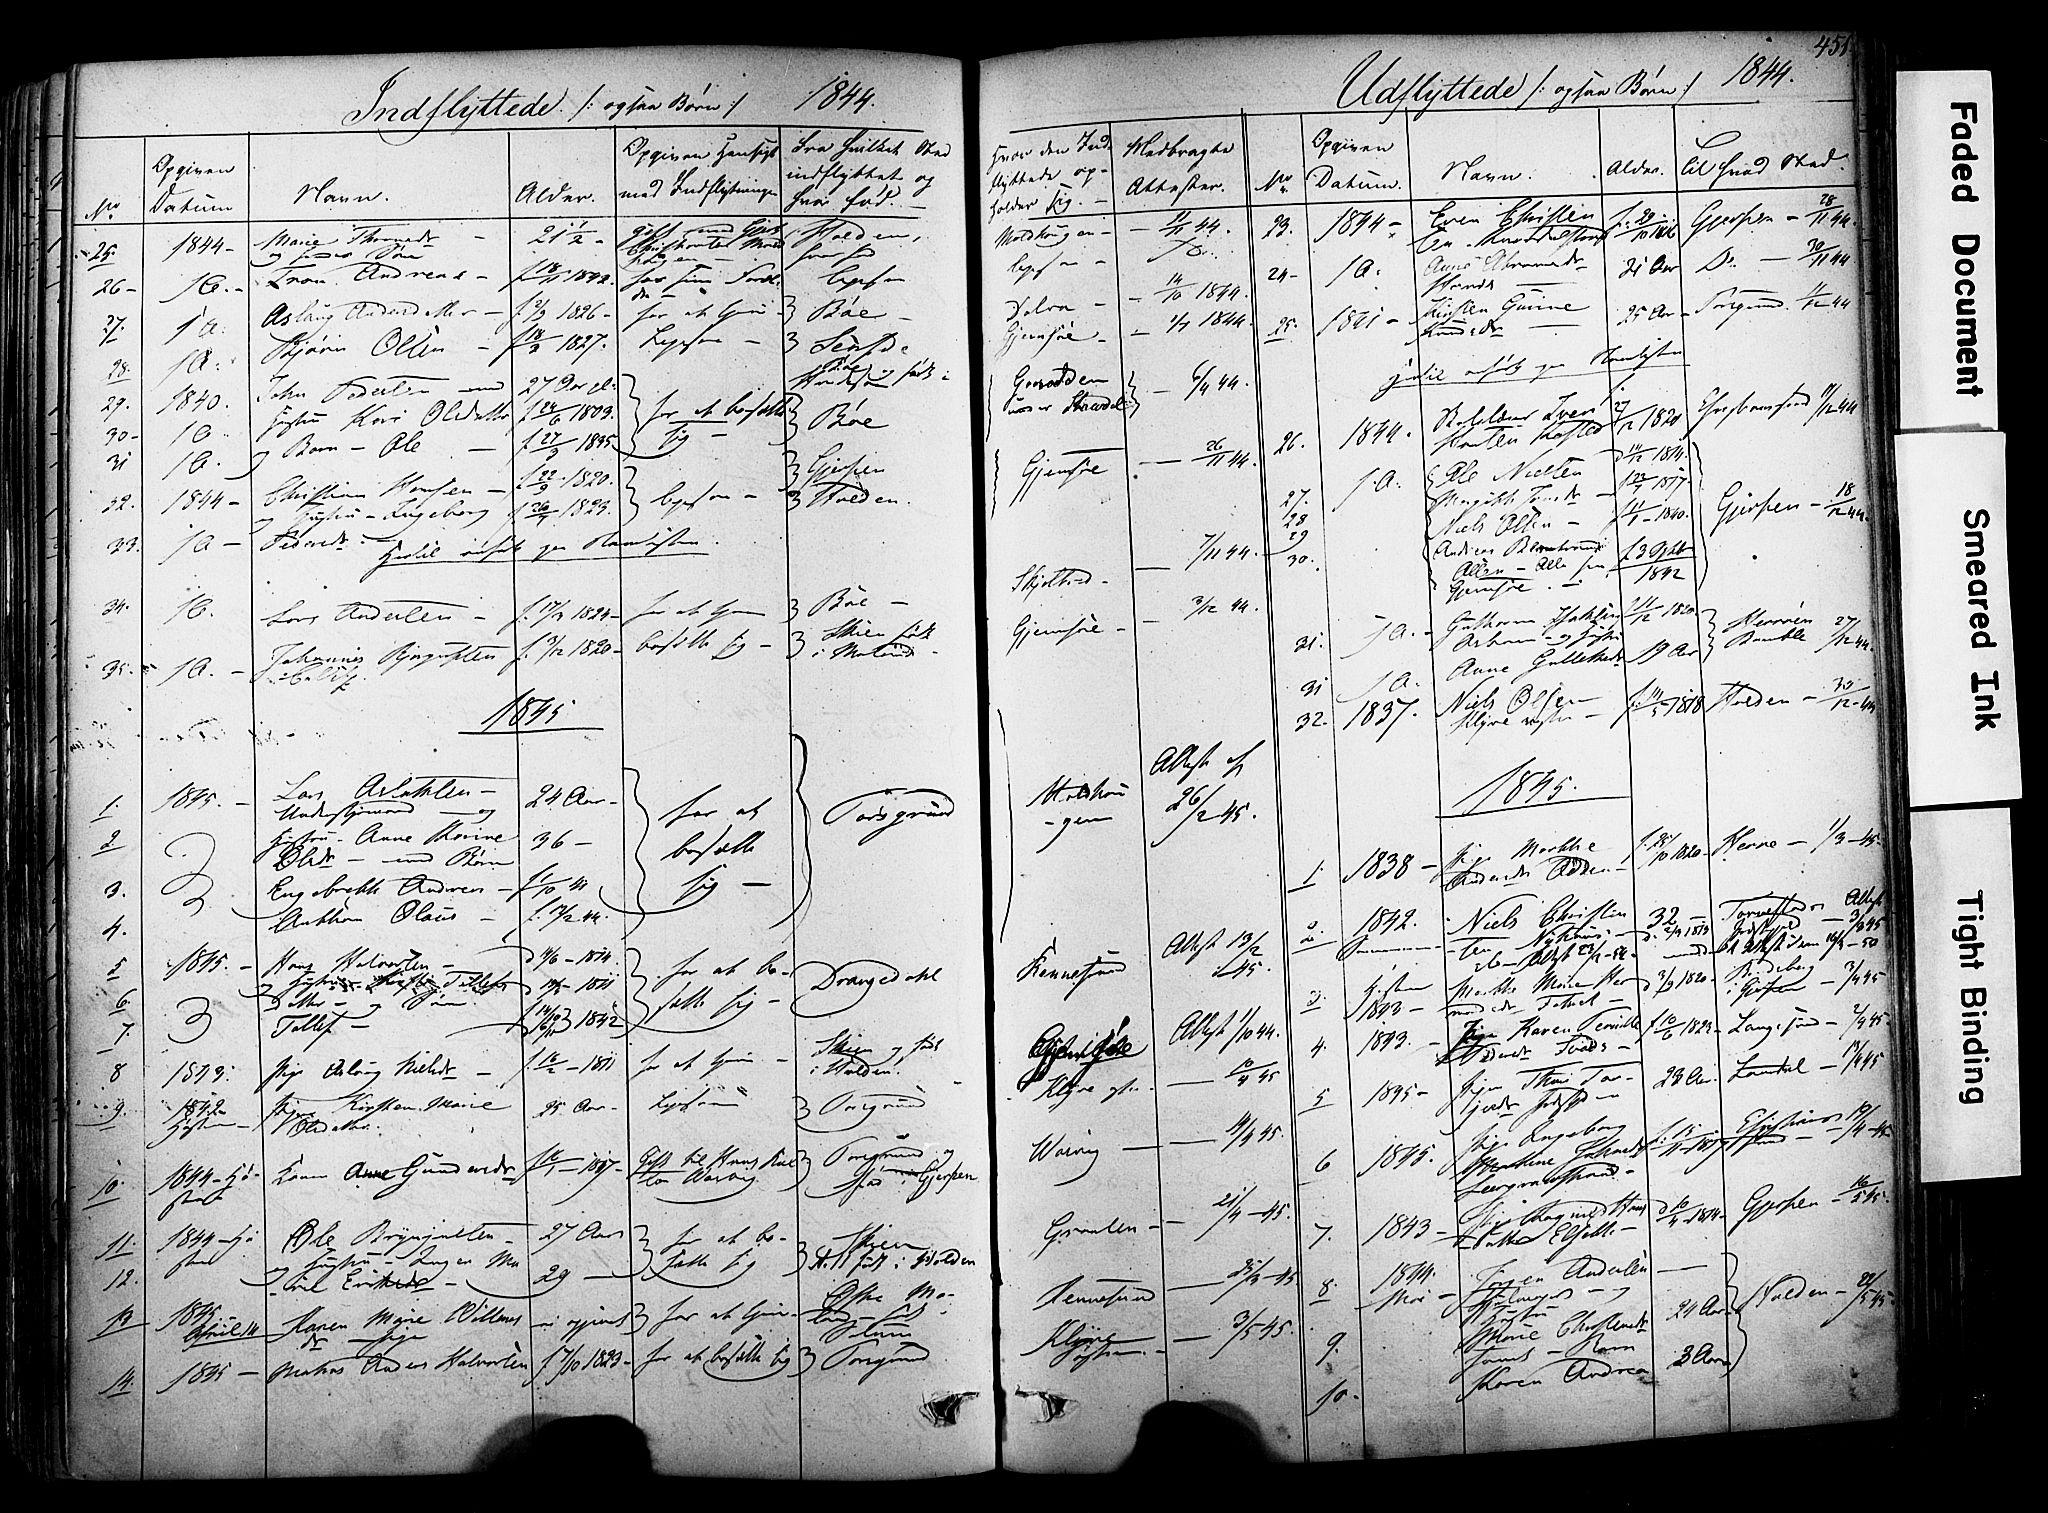 SAKO, Solum kirkebøker, F/Fa/L0006: Ministerialbok nr. I 6, 1844-1855, s. 451